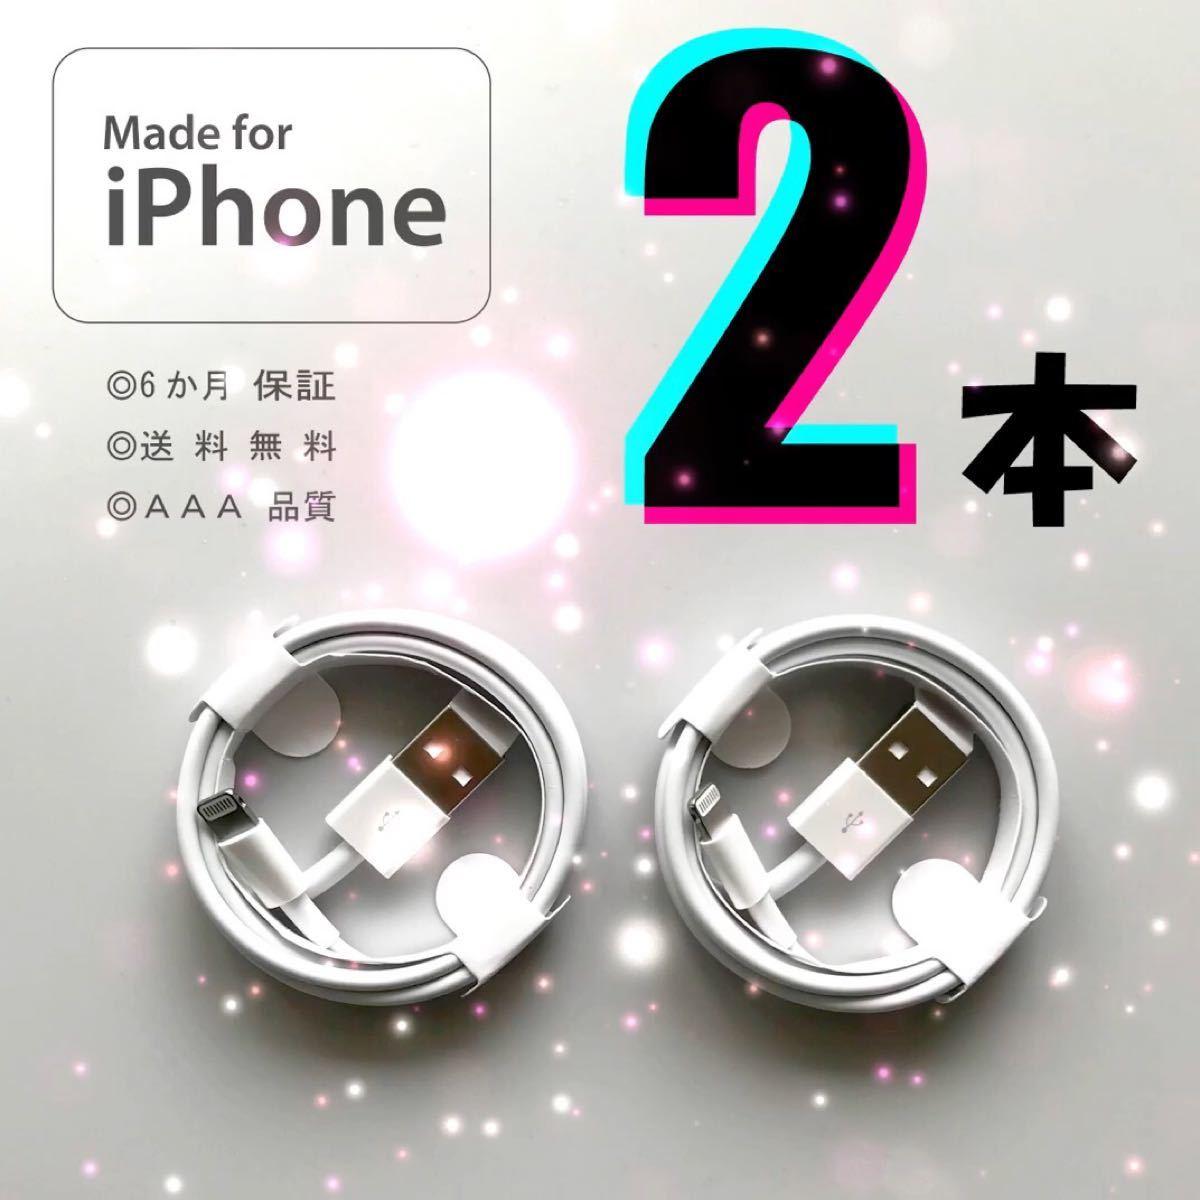 iPhone 充電器 充電ケーブル コード lightning cable 急速充電 2本セット